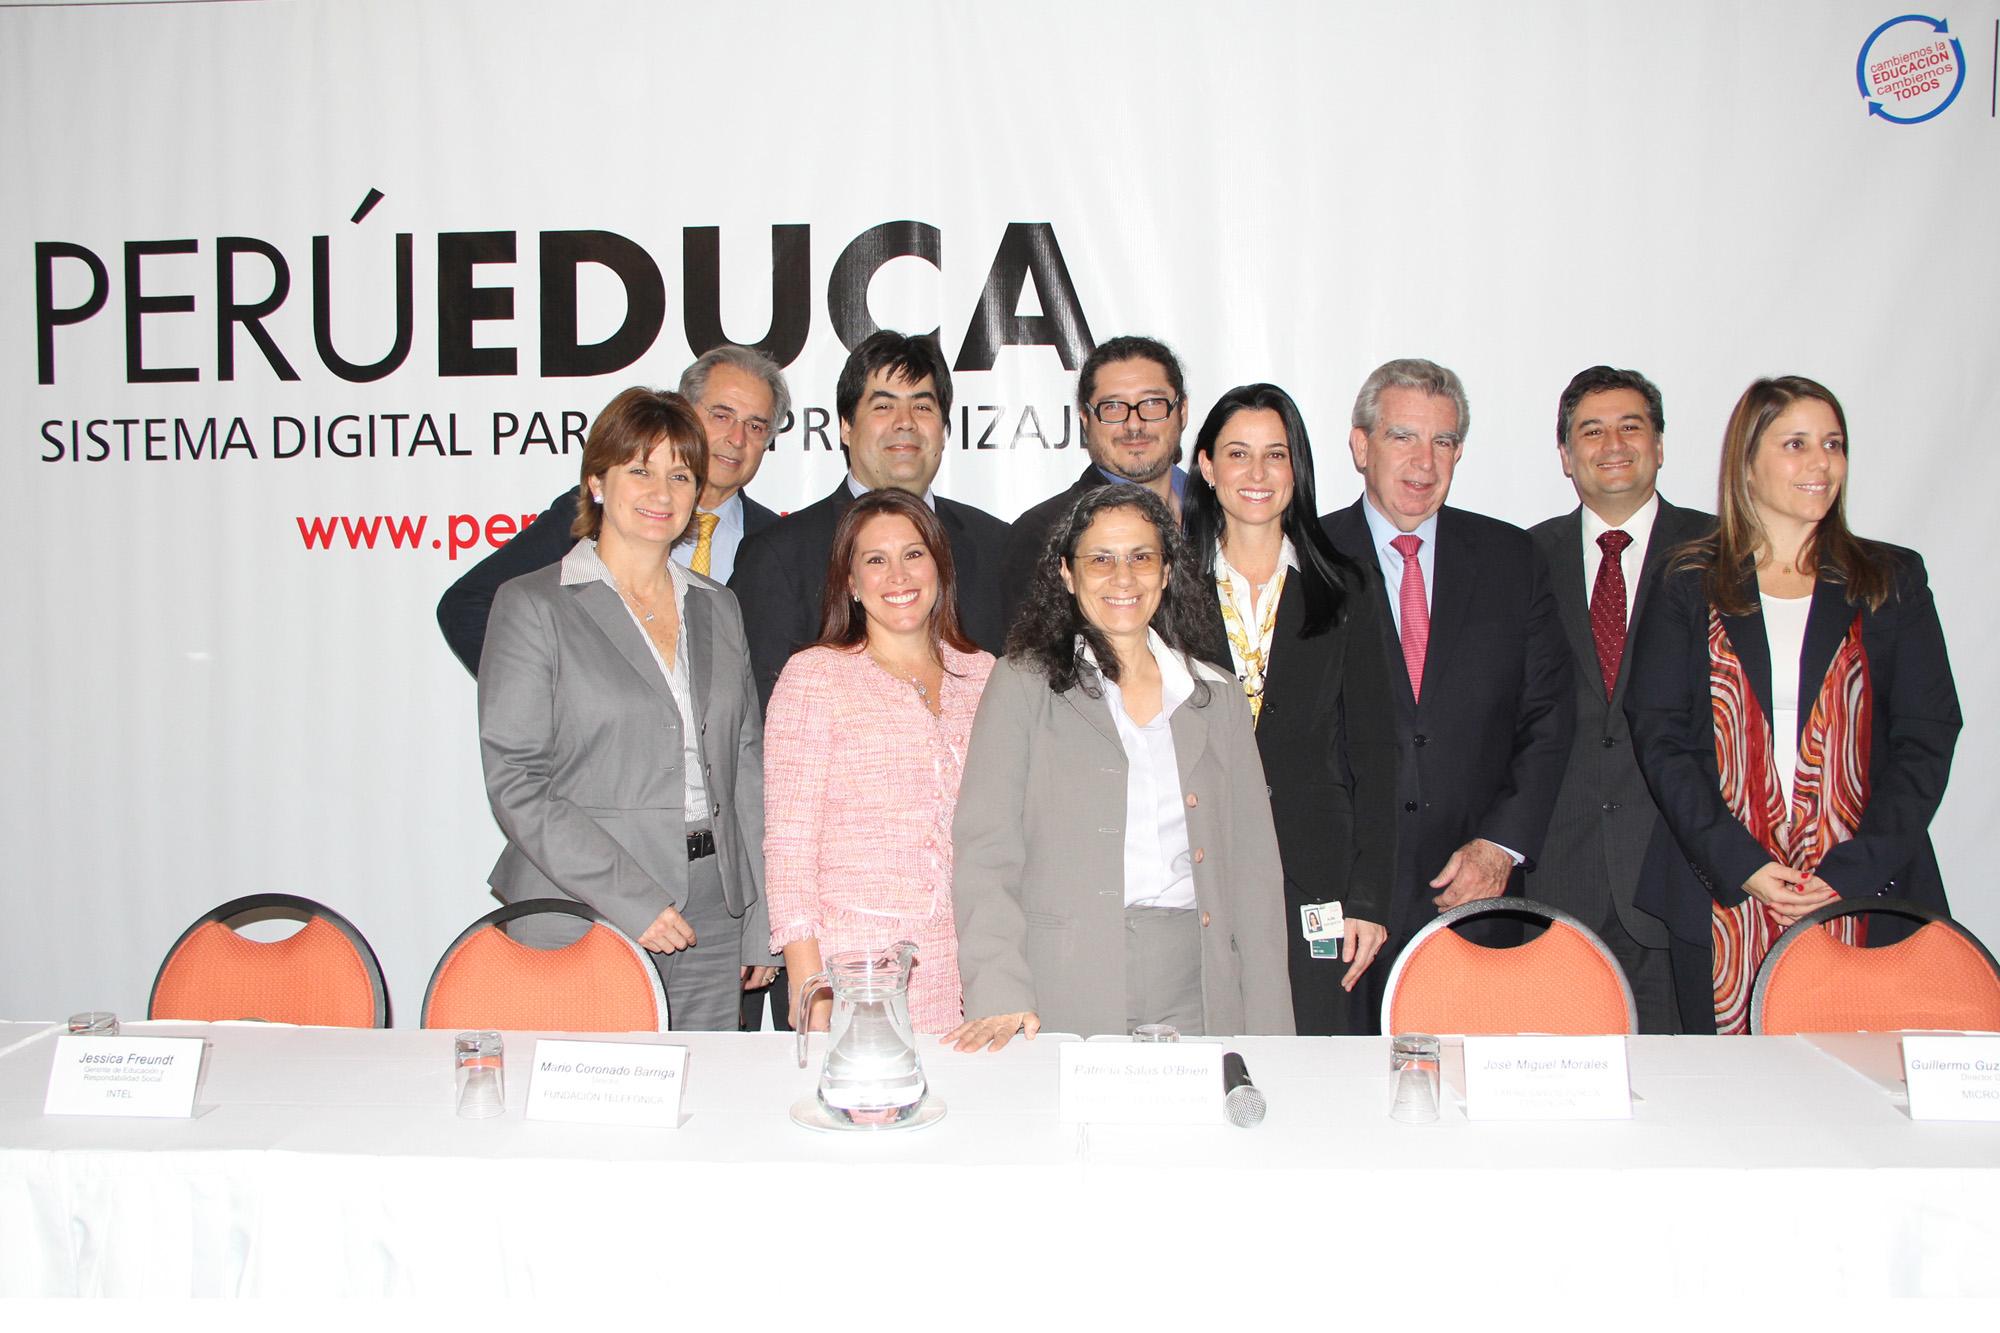 Peru Educa IBM